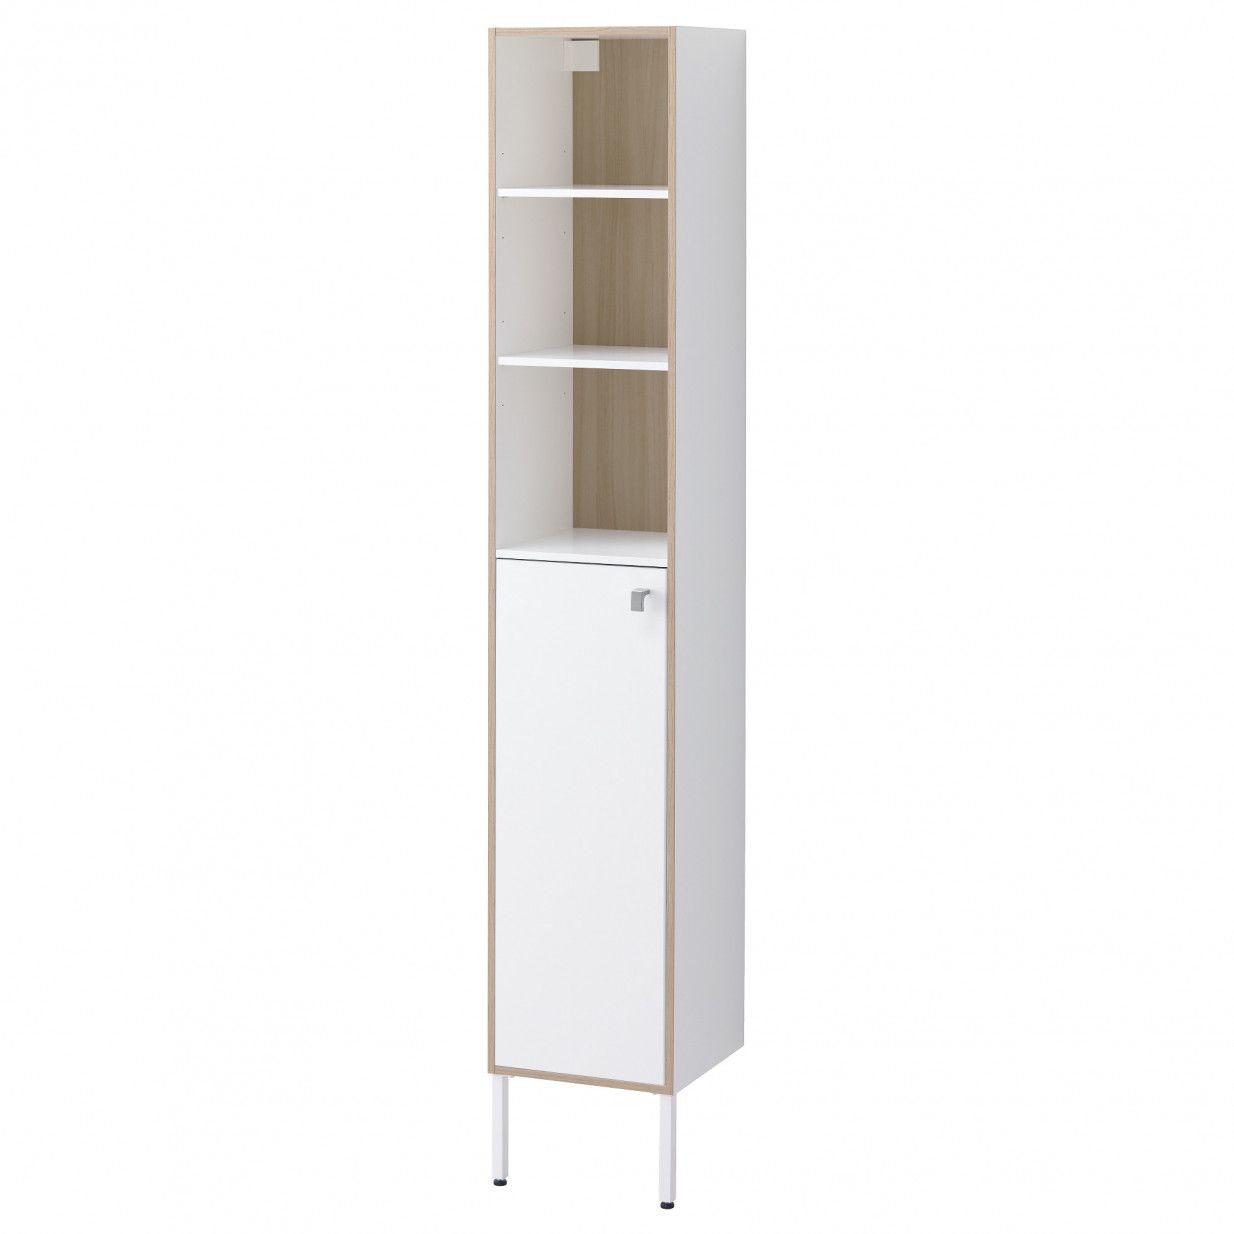 Tall Bathroom Storage Cabinet Ikea pinhendro birowo on modern design low budget | pinterest | tall